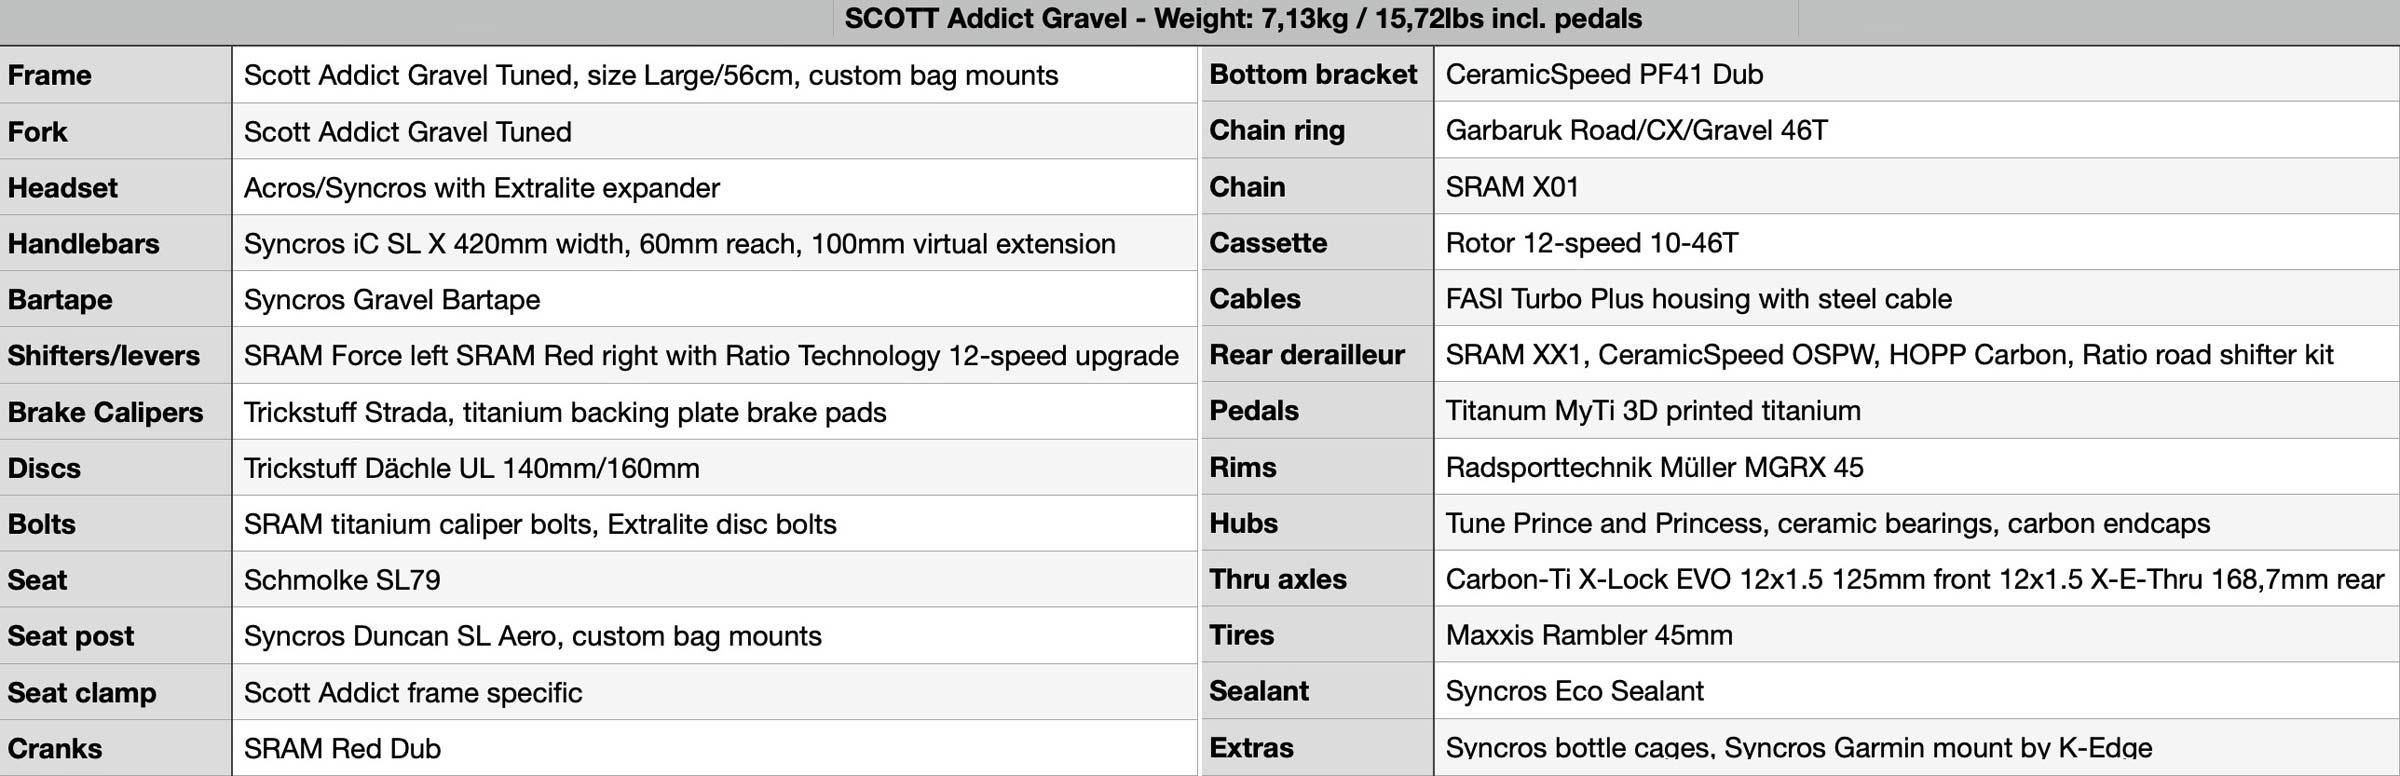 custom Scott Addict Gravel Tuned Dangerholm edition lightweight carbon prototype gravel bike project,tech specs